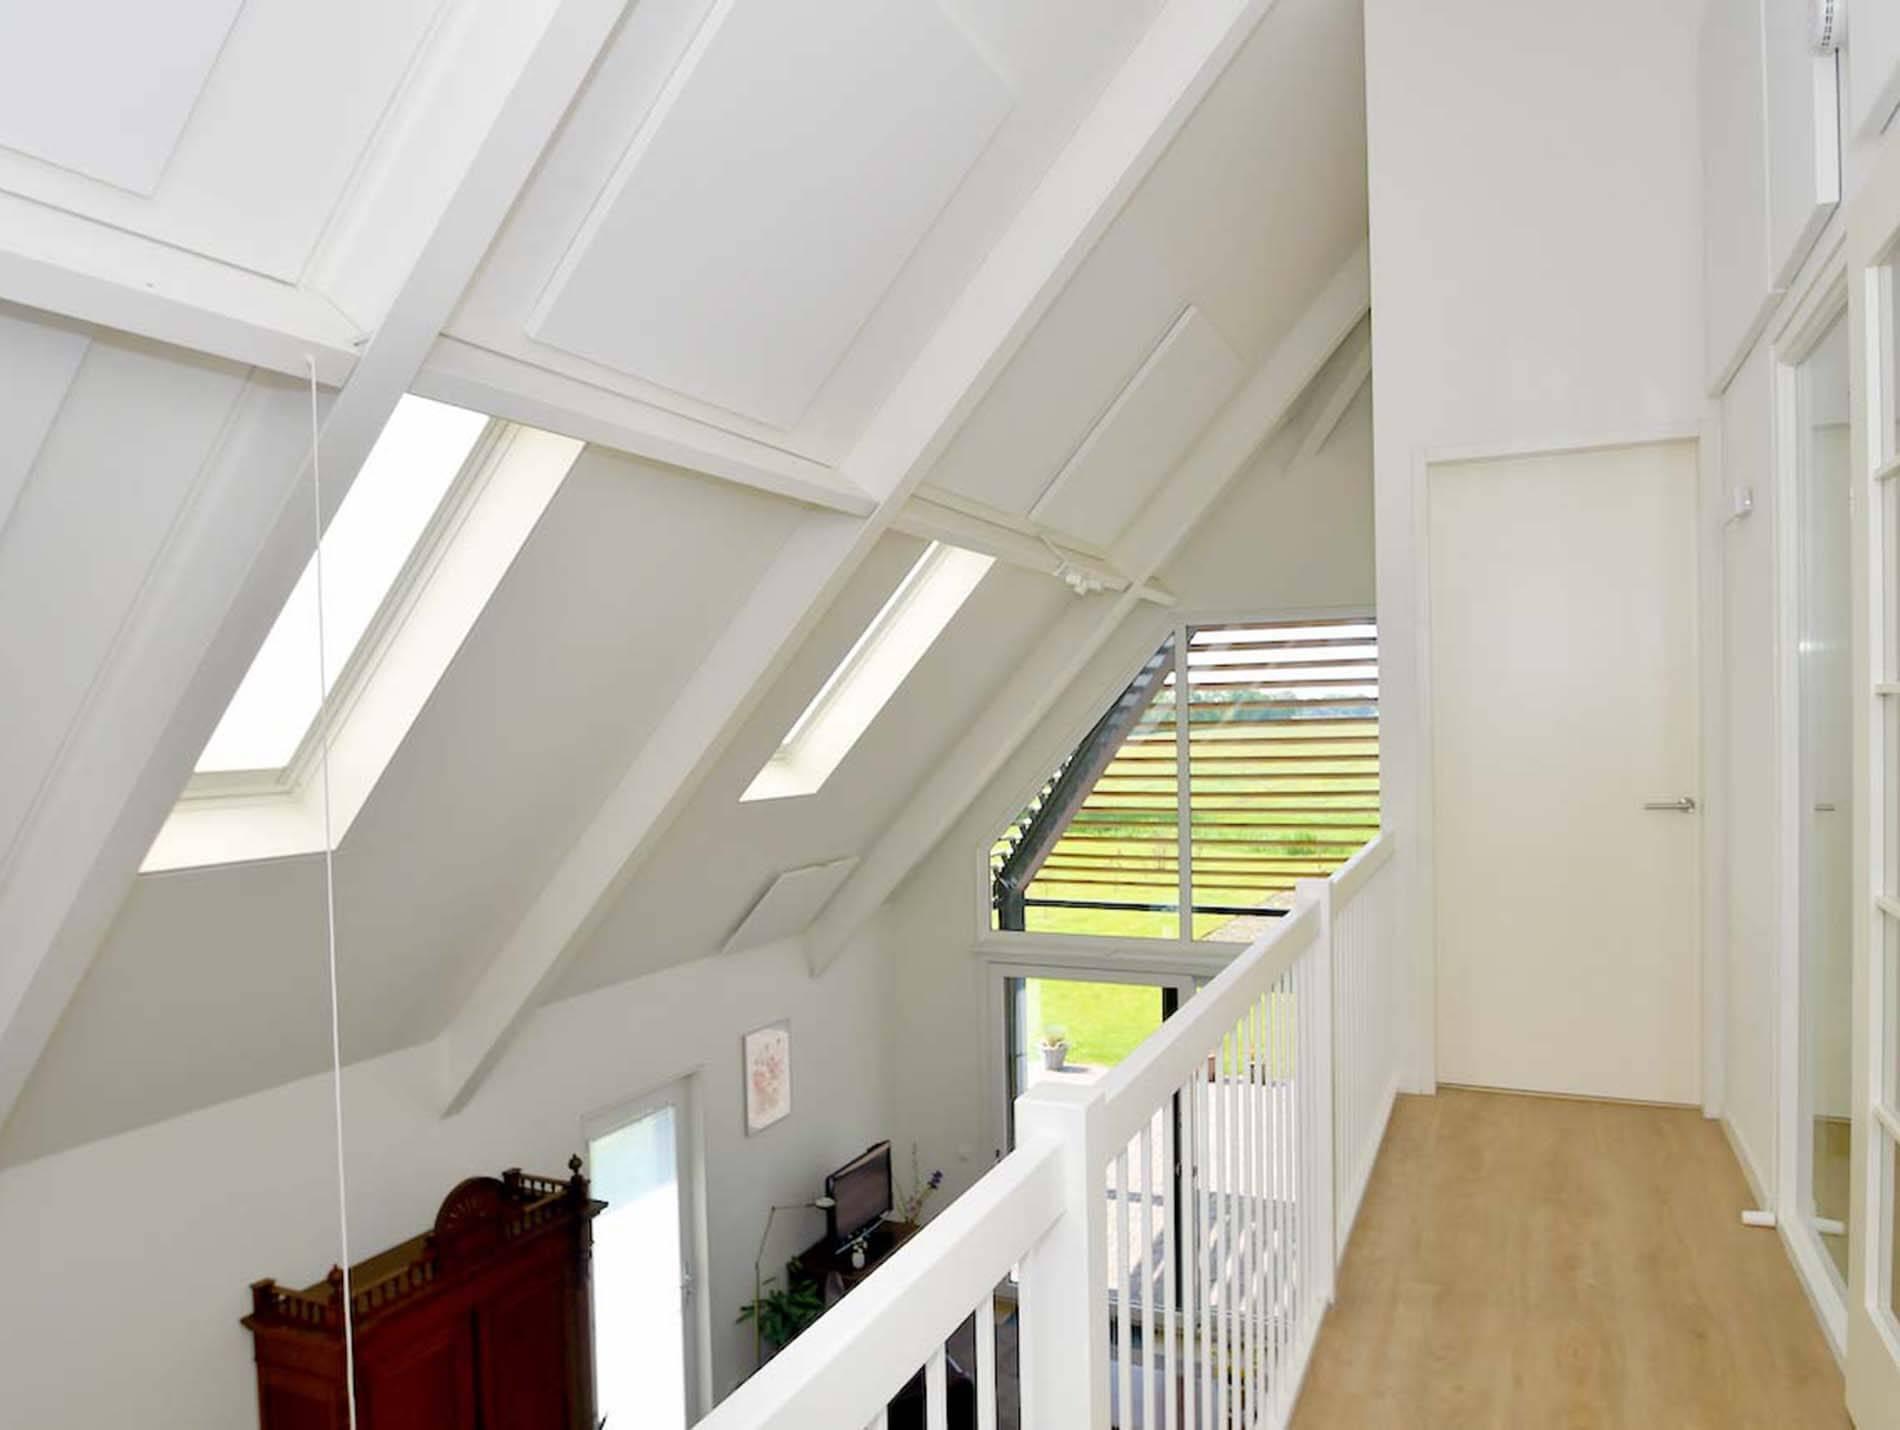 2. interieur-Wijnjewouden-particuliere-woning-1900x1430p.jpg